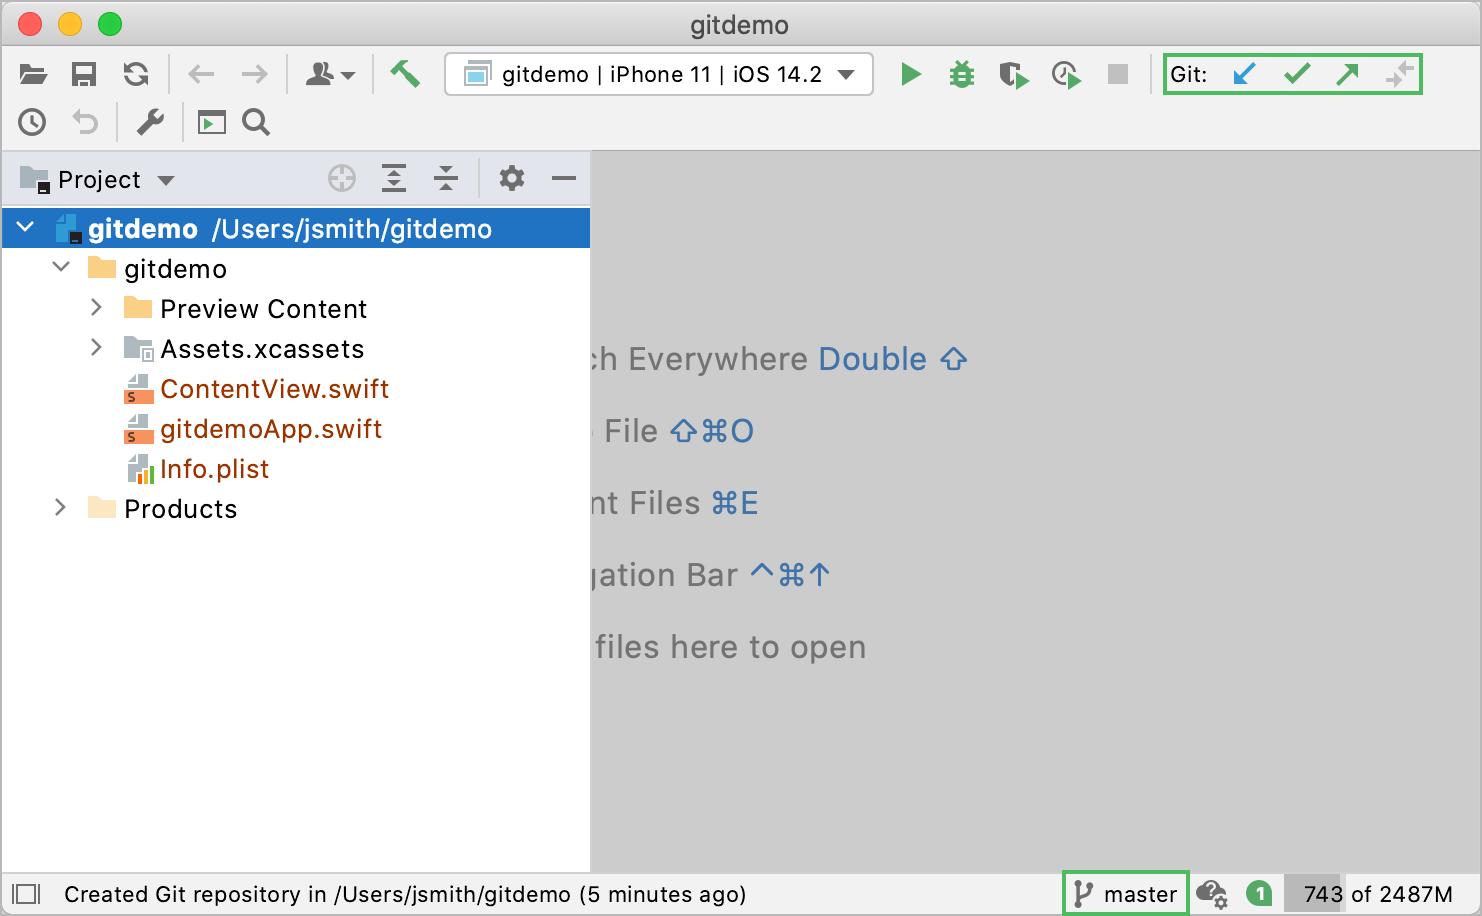 The Git tool window